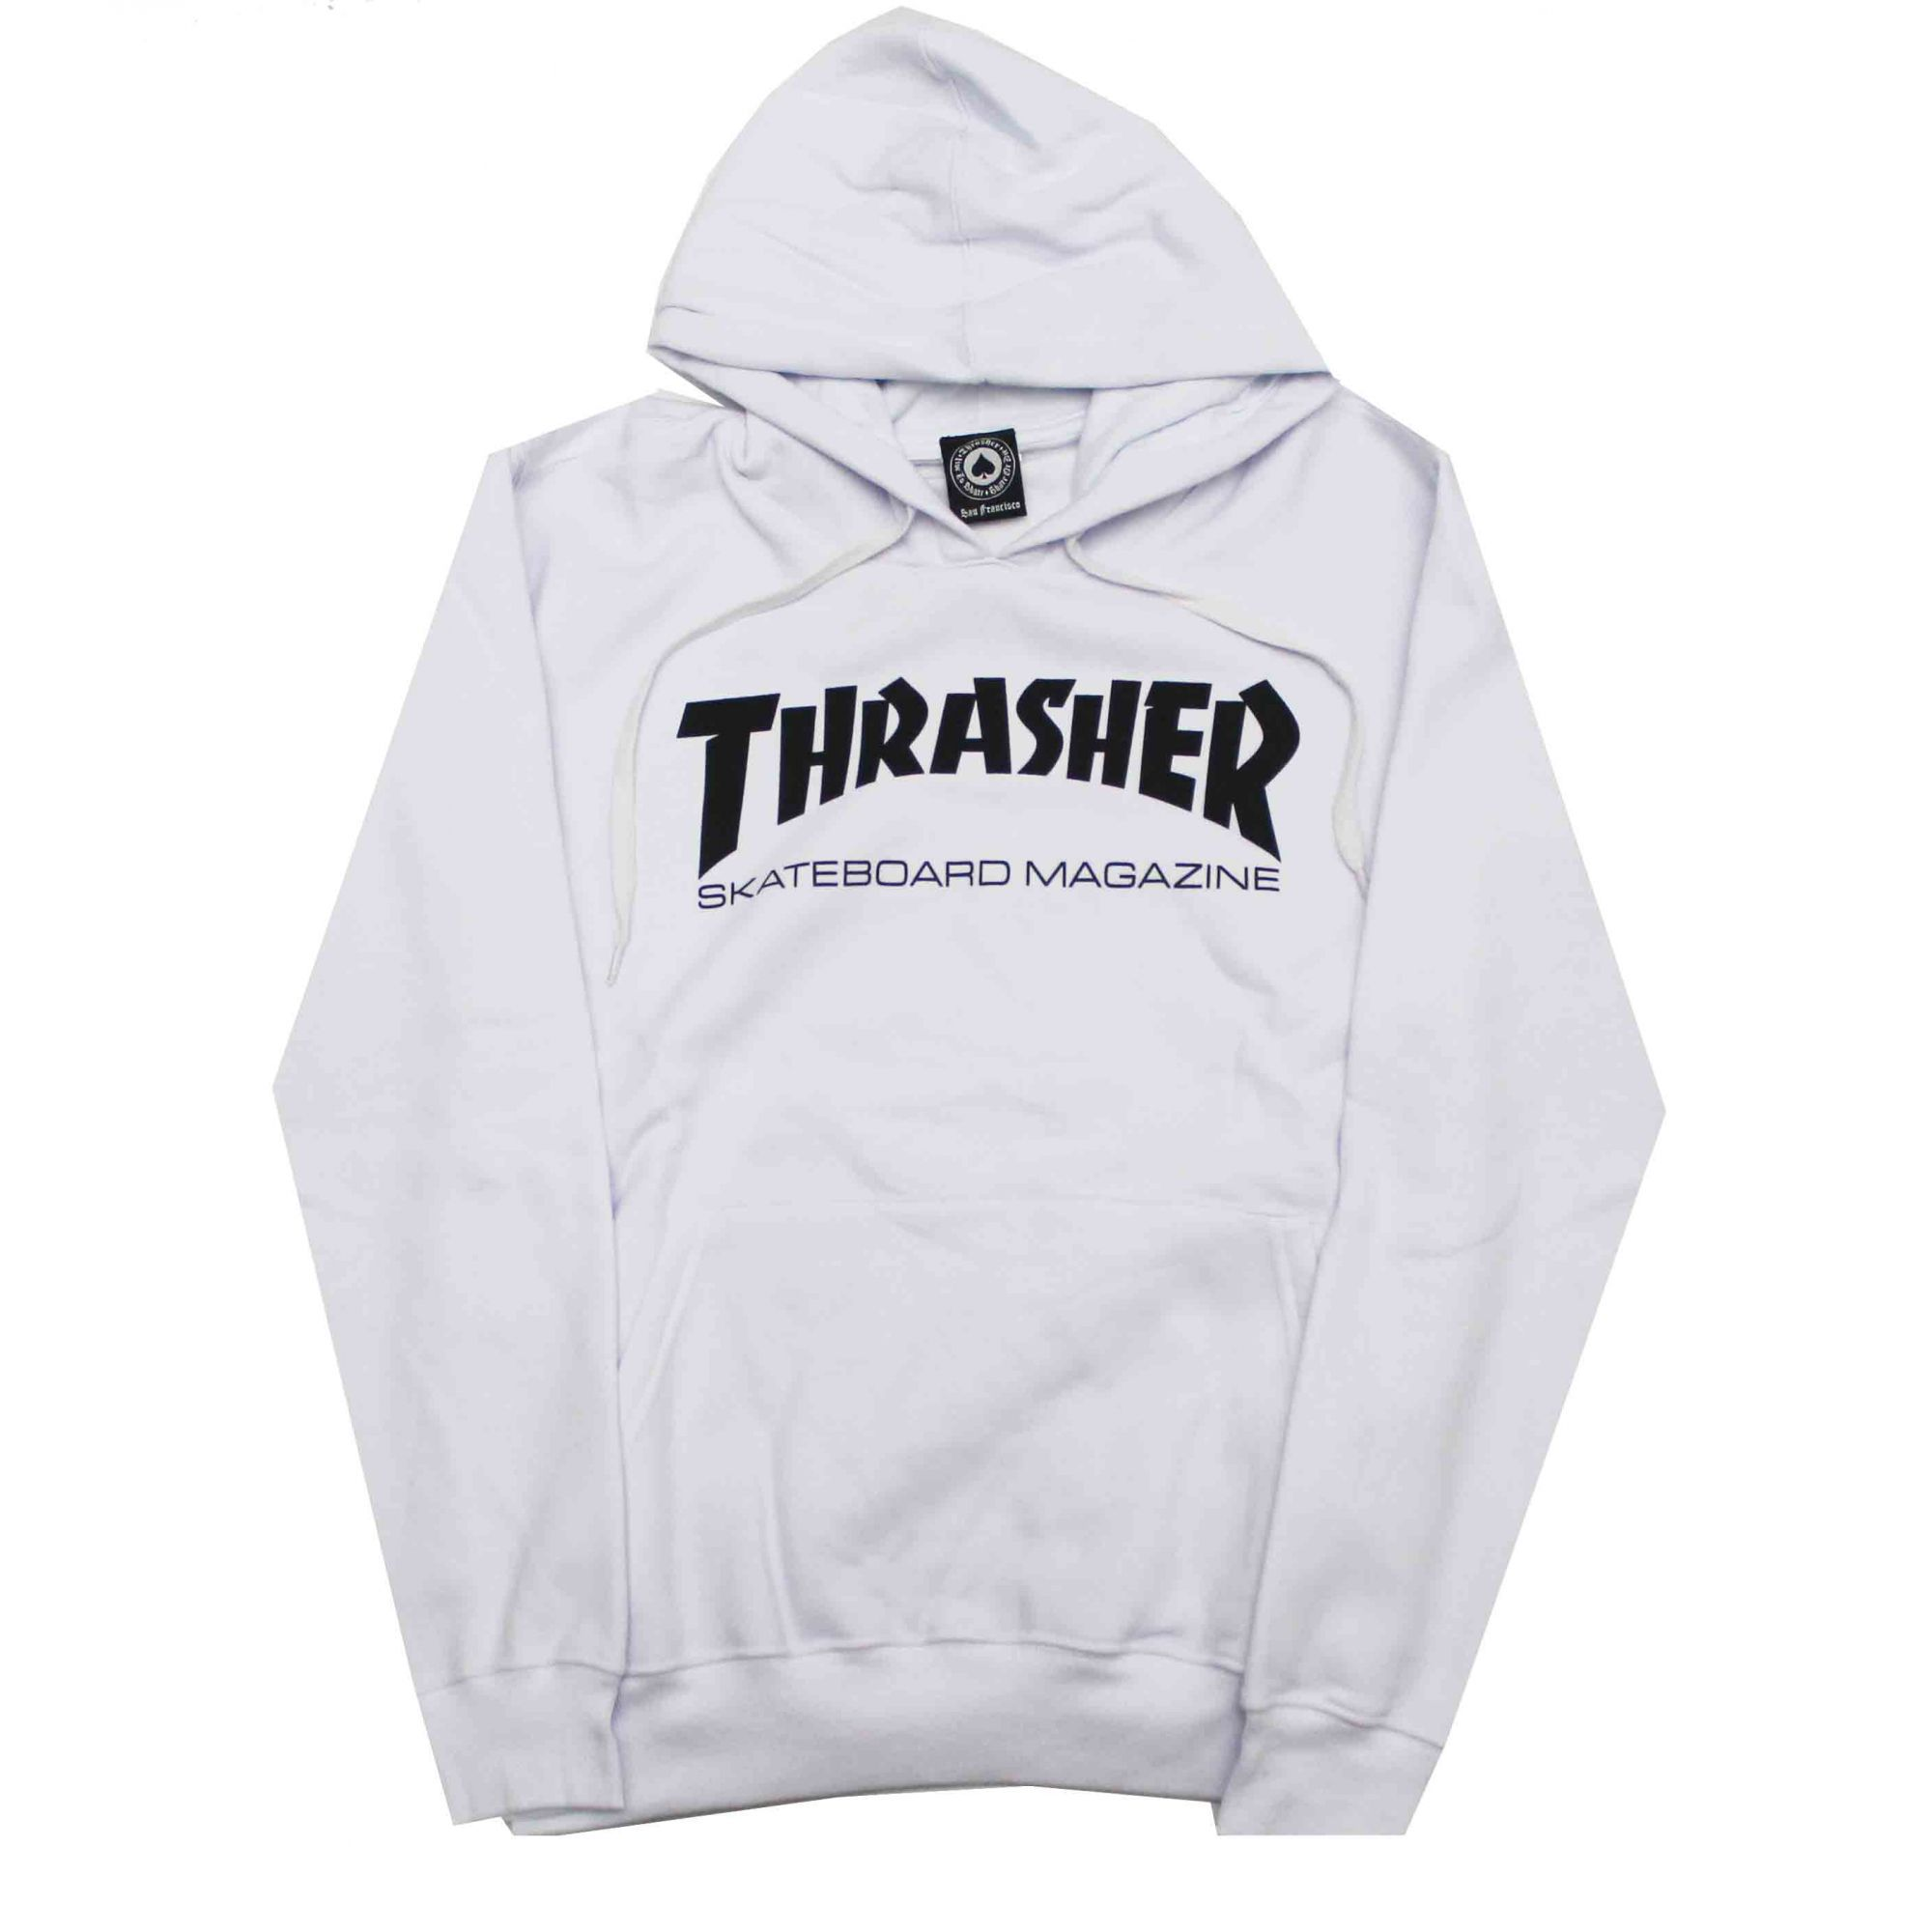 Moletom Thrasher Magazine Canguru Skate Mag - Branco